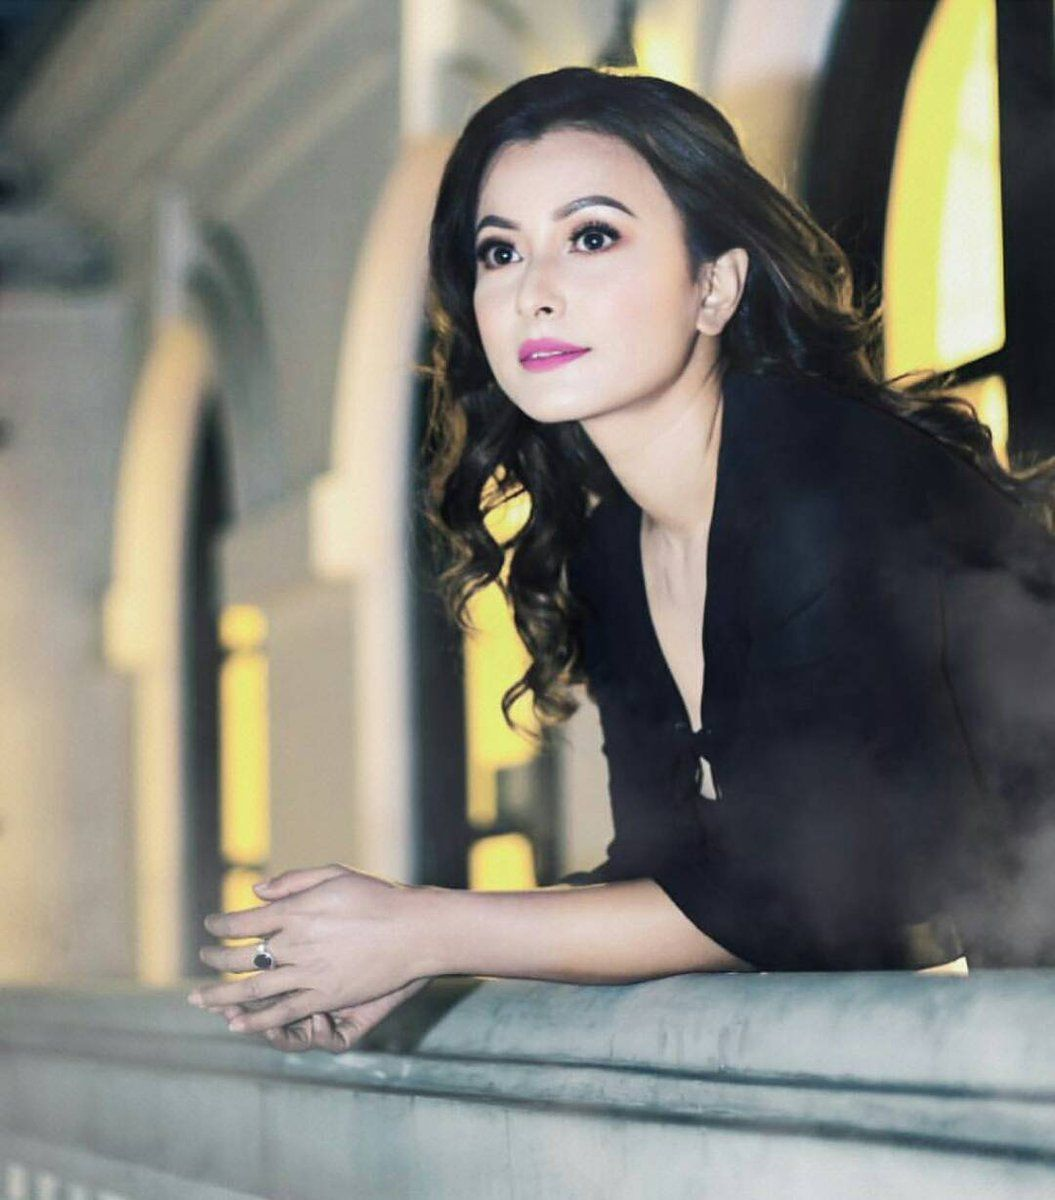 Namrata Shrestha nudes (17 fotos), fotos Tits, Instagram, butt 2019